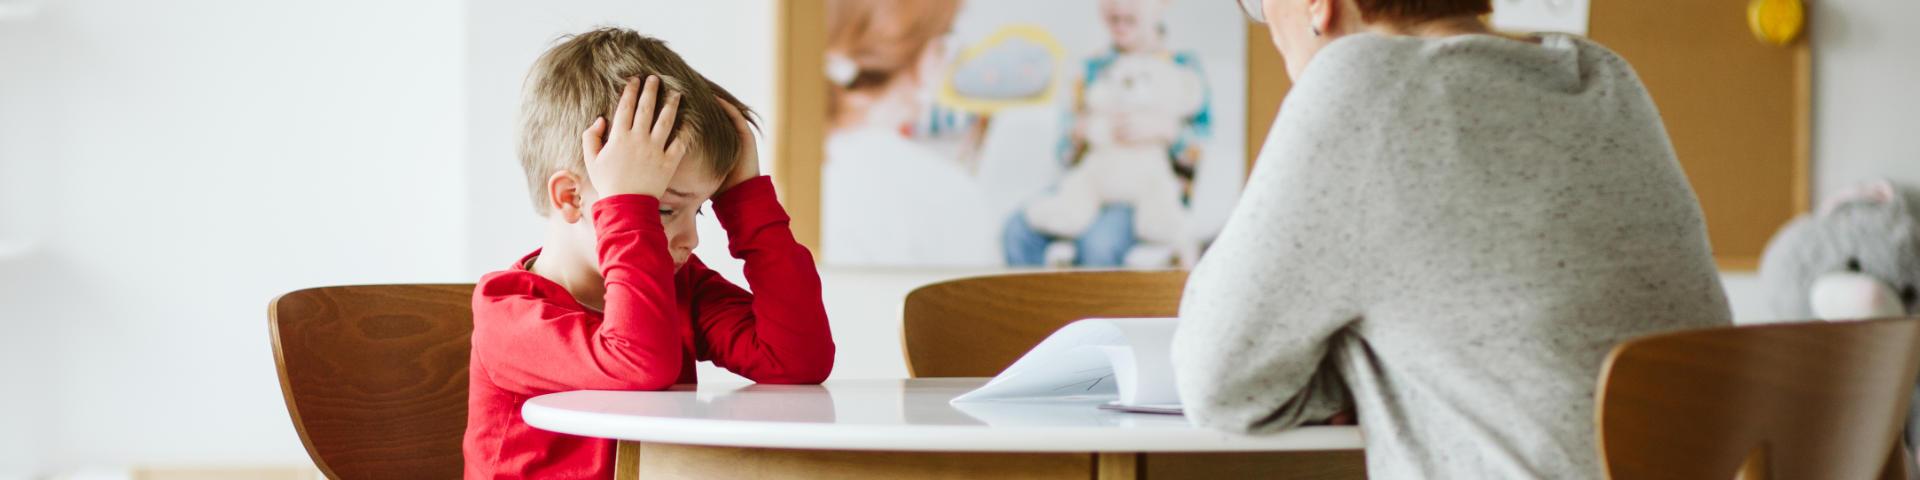 ADHD Treatment Specialist Talking to Upset Little Boy